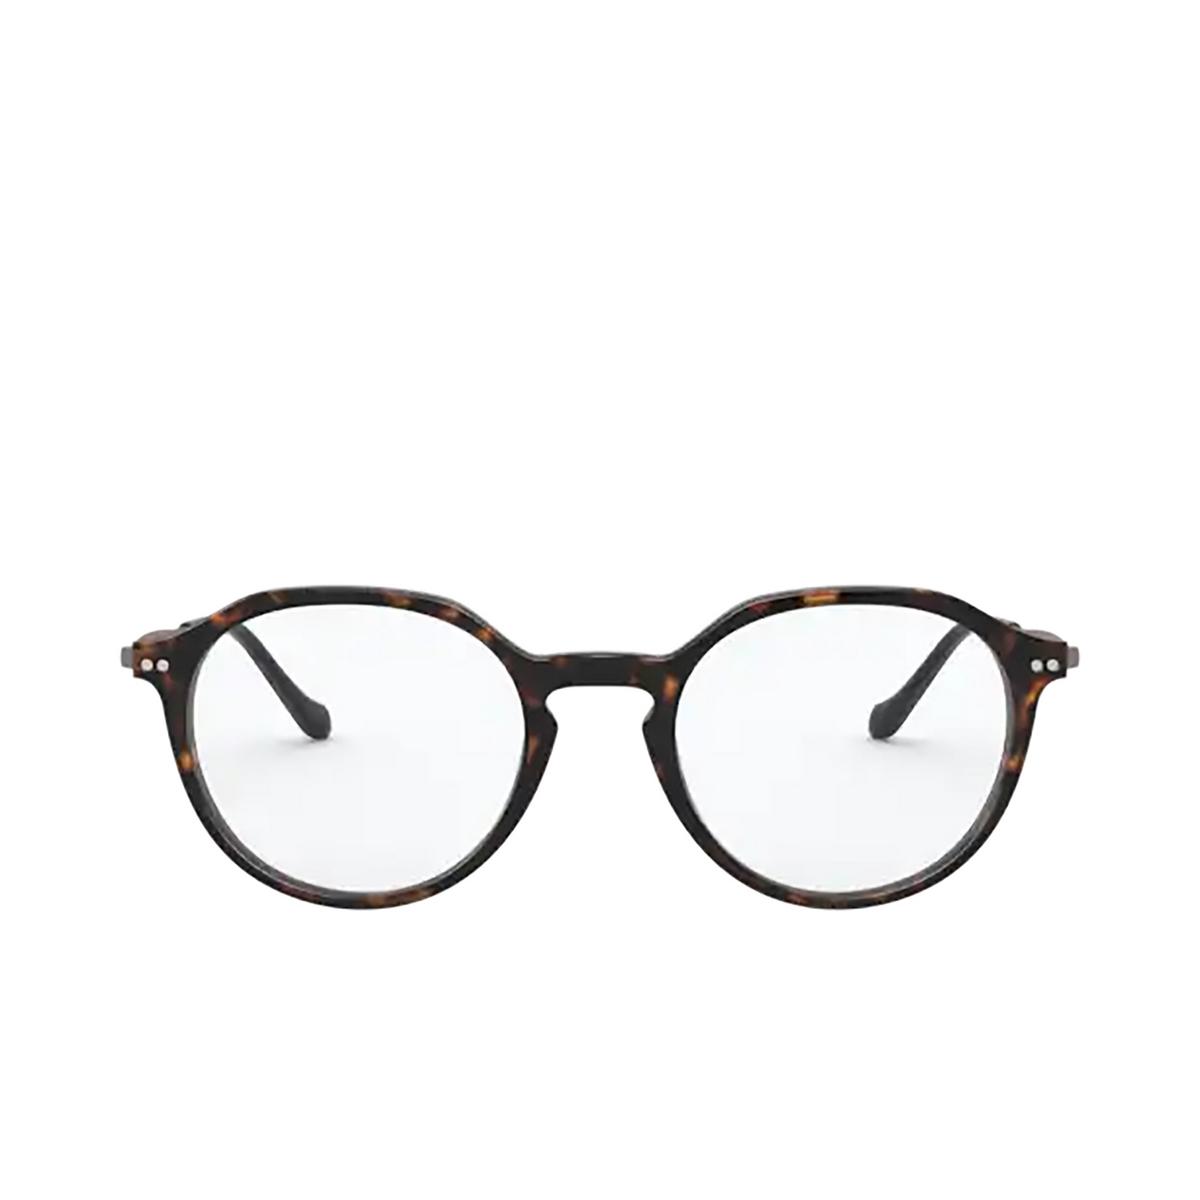 Giorgio Armani® Round Eyeglasses: AR7191 color Havana 5026 - front view.